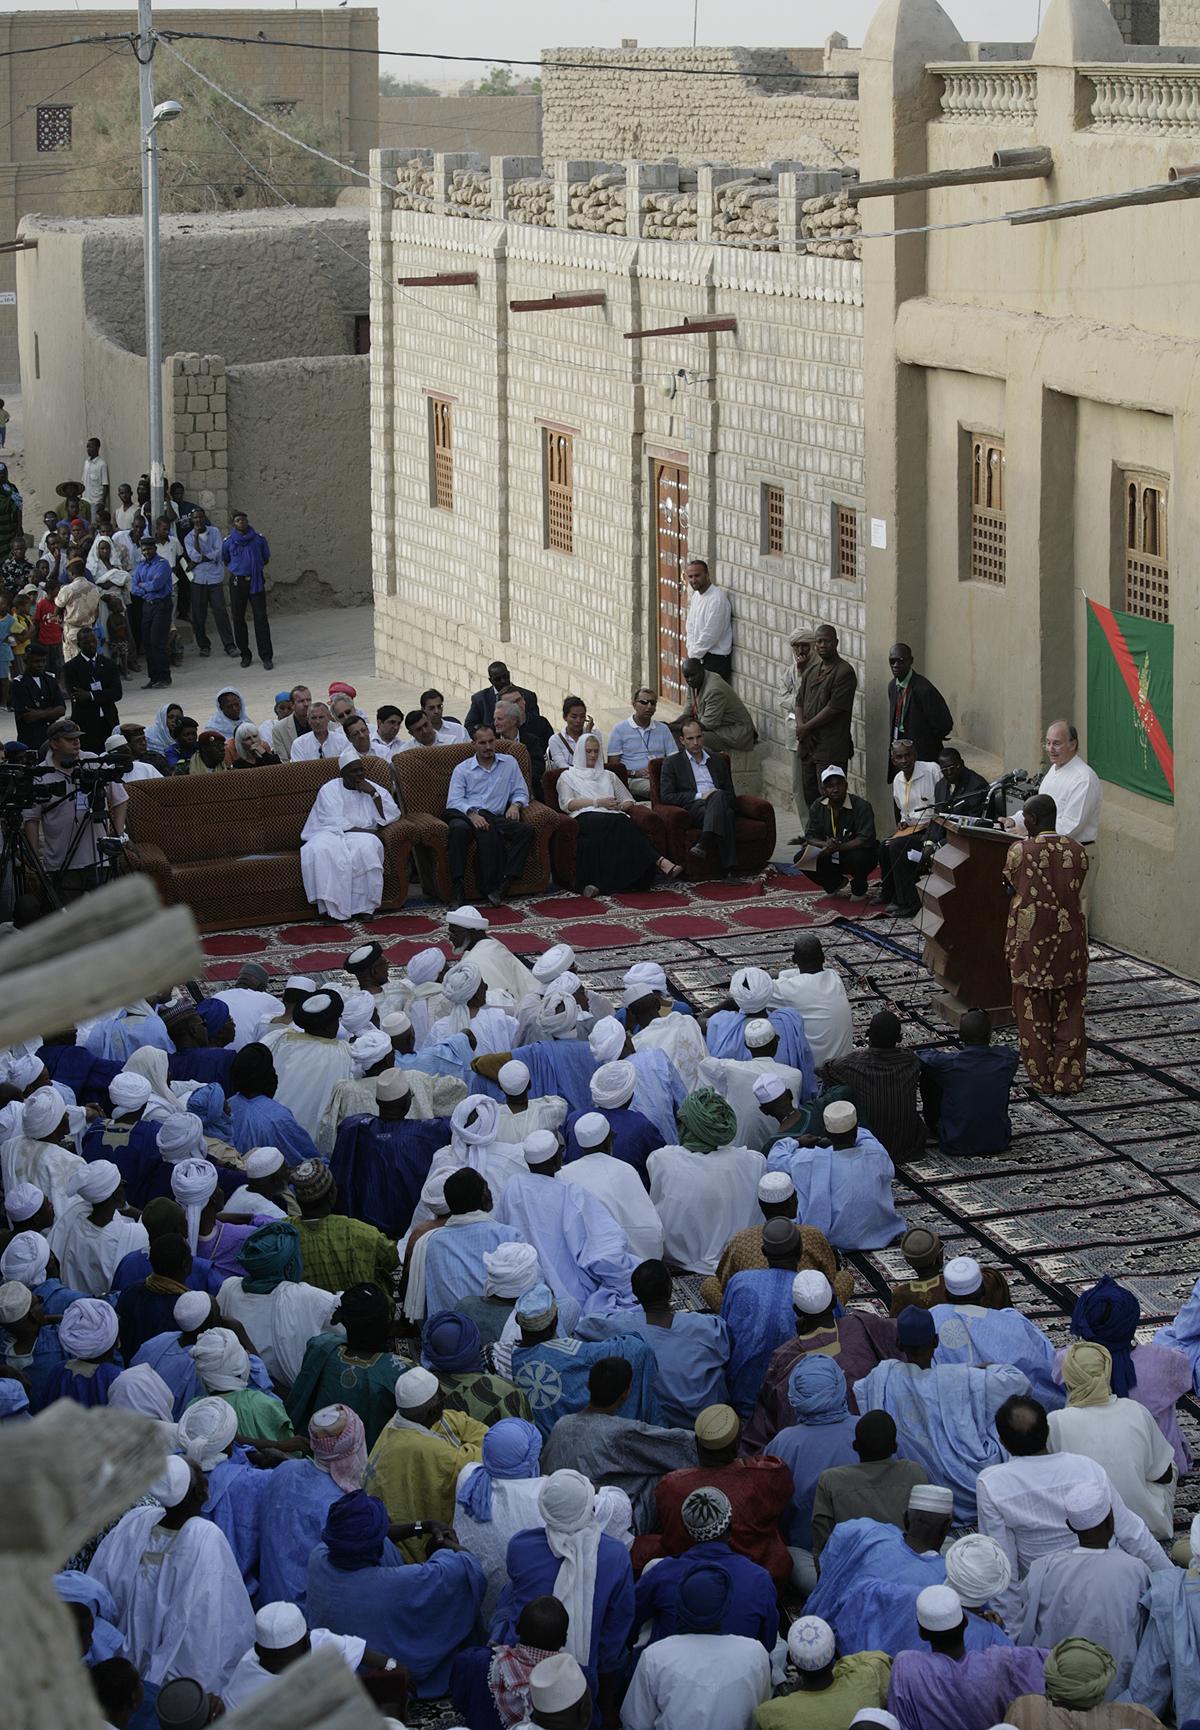 Mali Aga Khan Honours the standard of the Ismaili Imamat